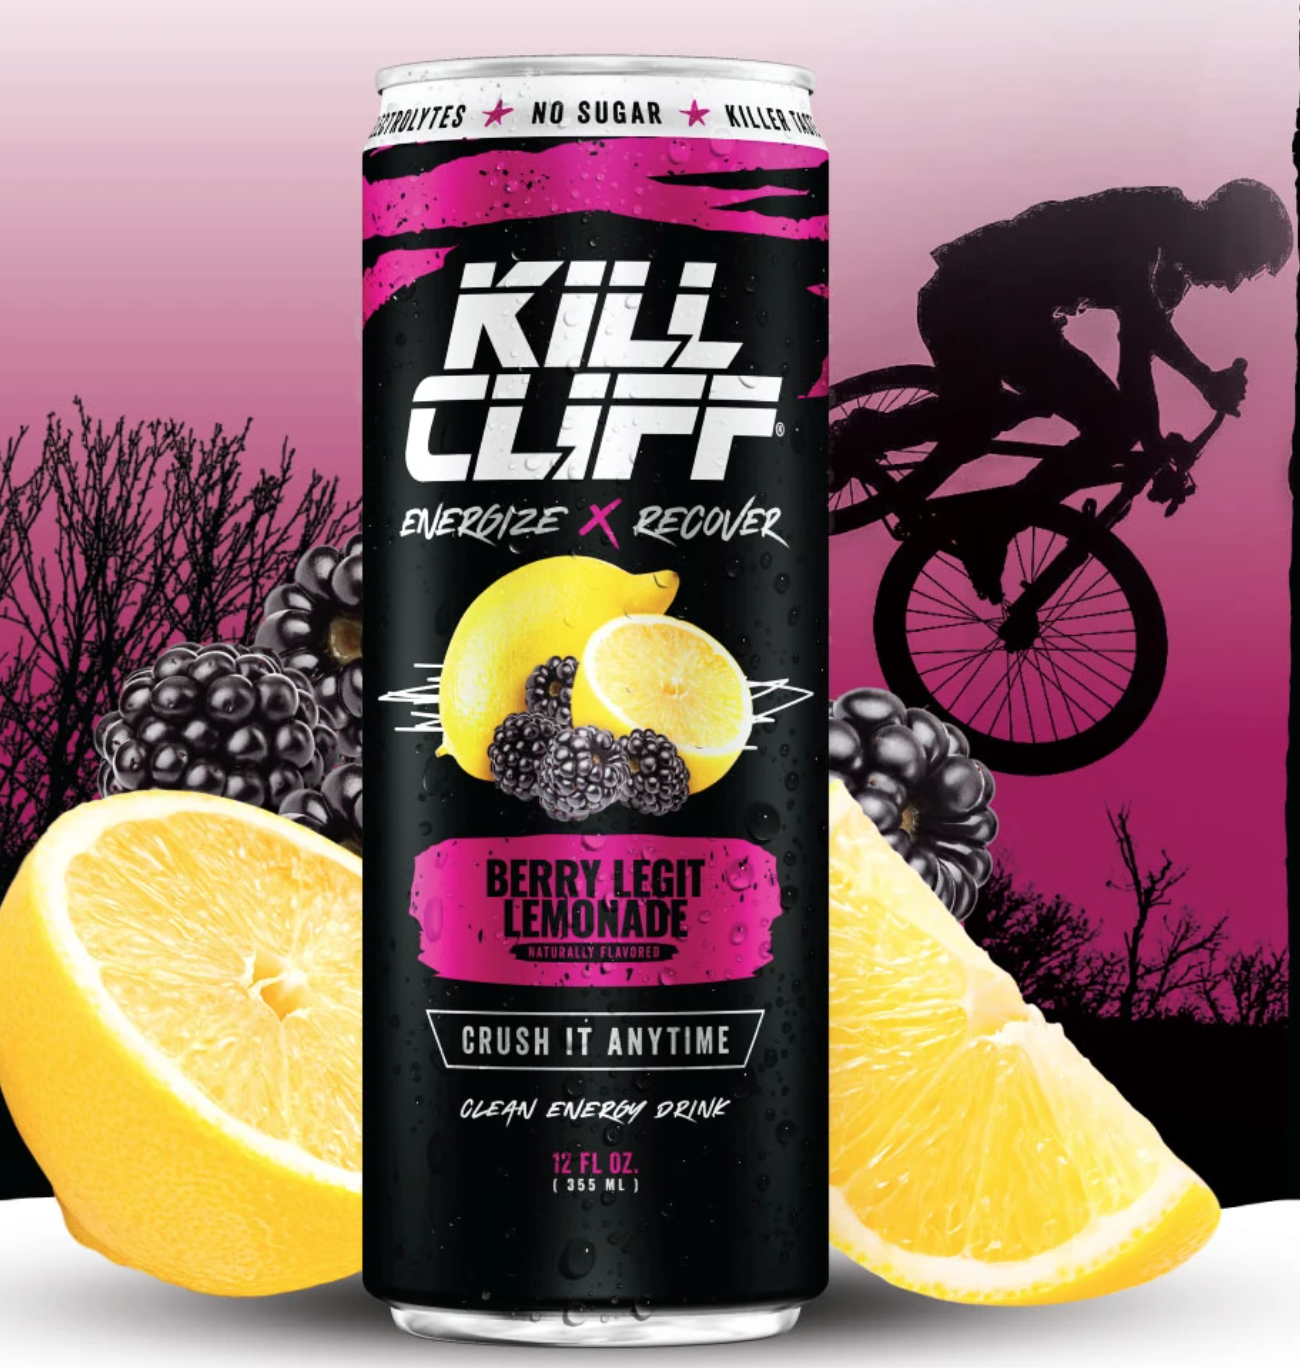 Kill Cliff Recover Berry Legit Lemonade